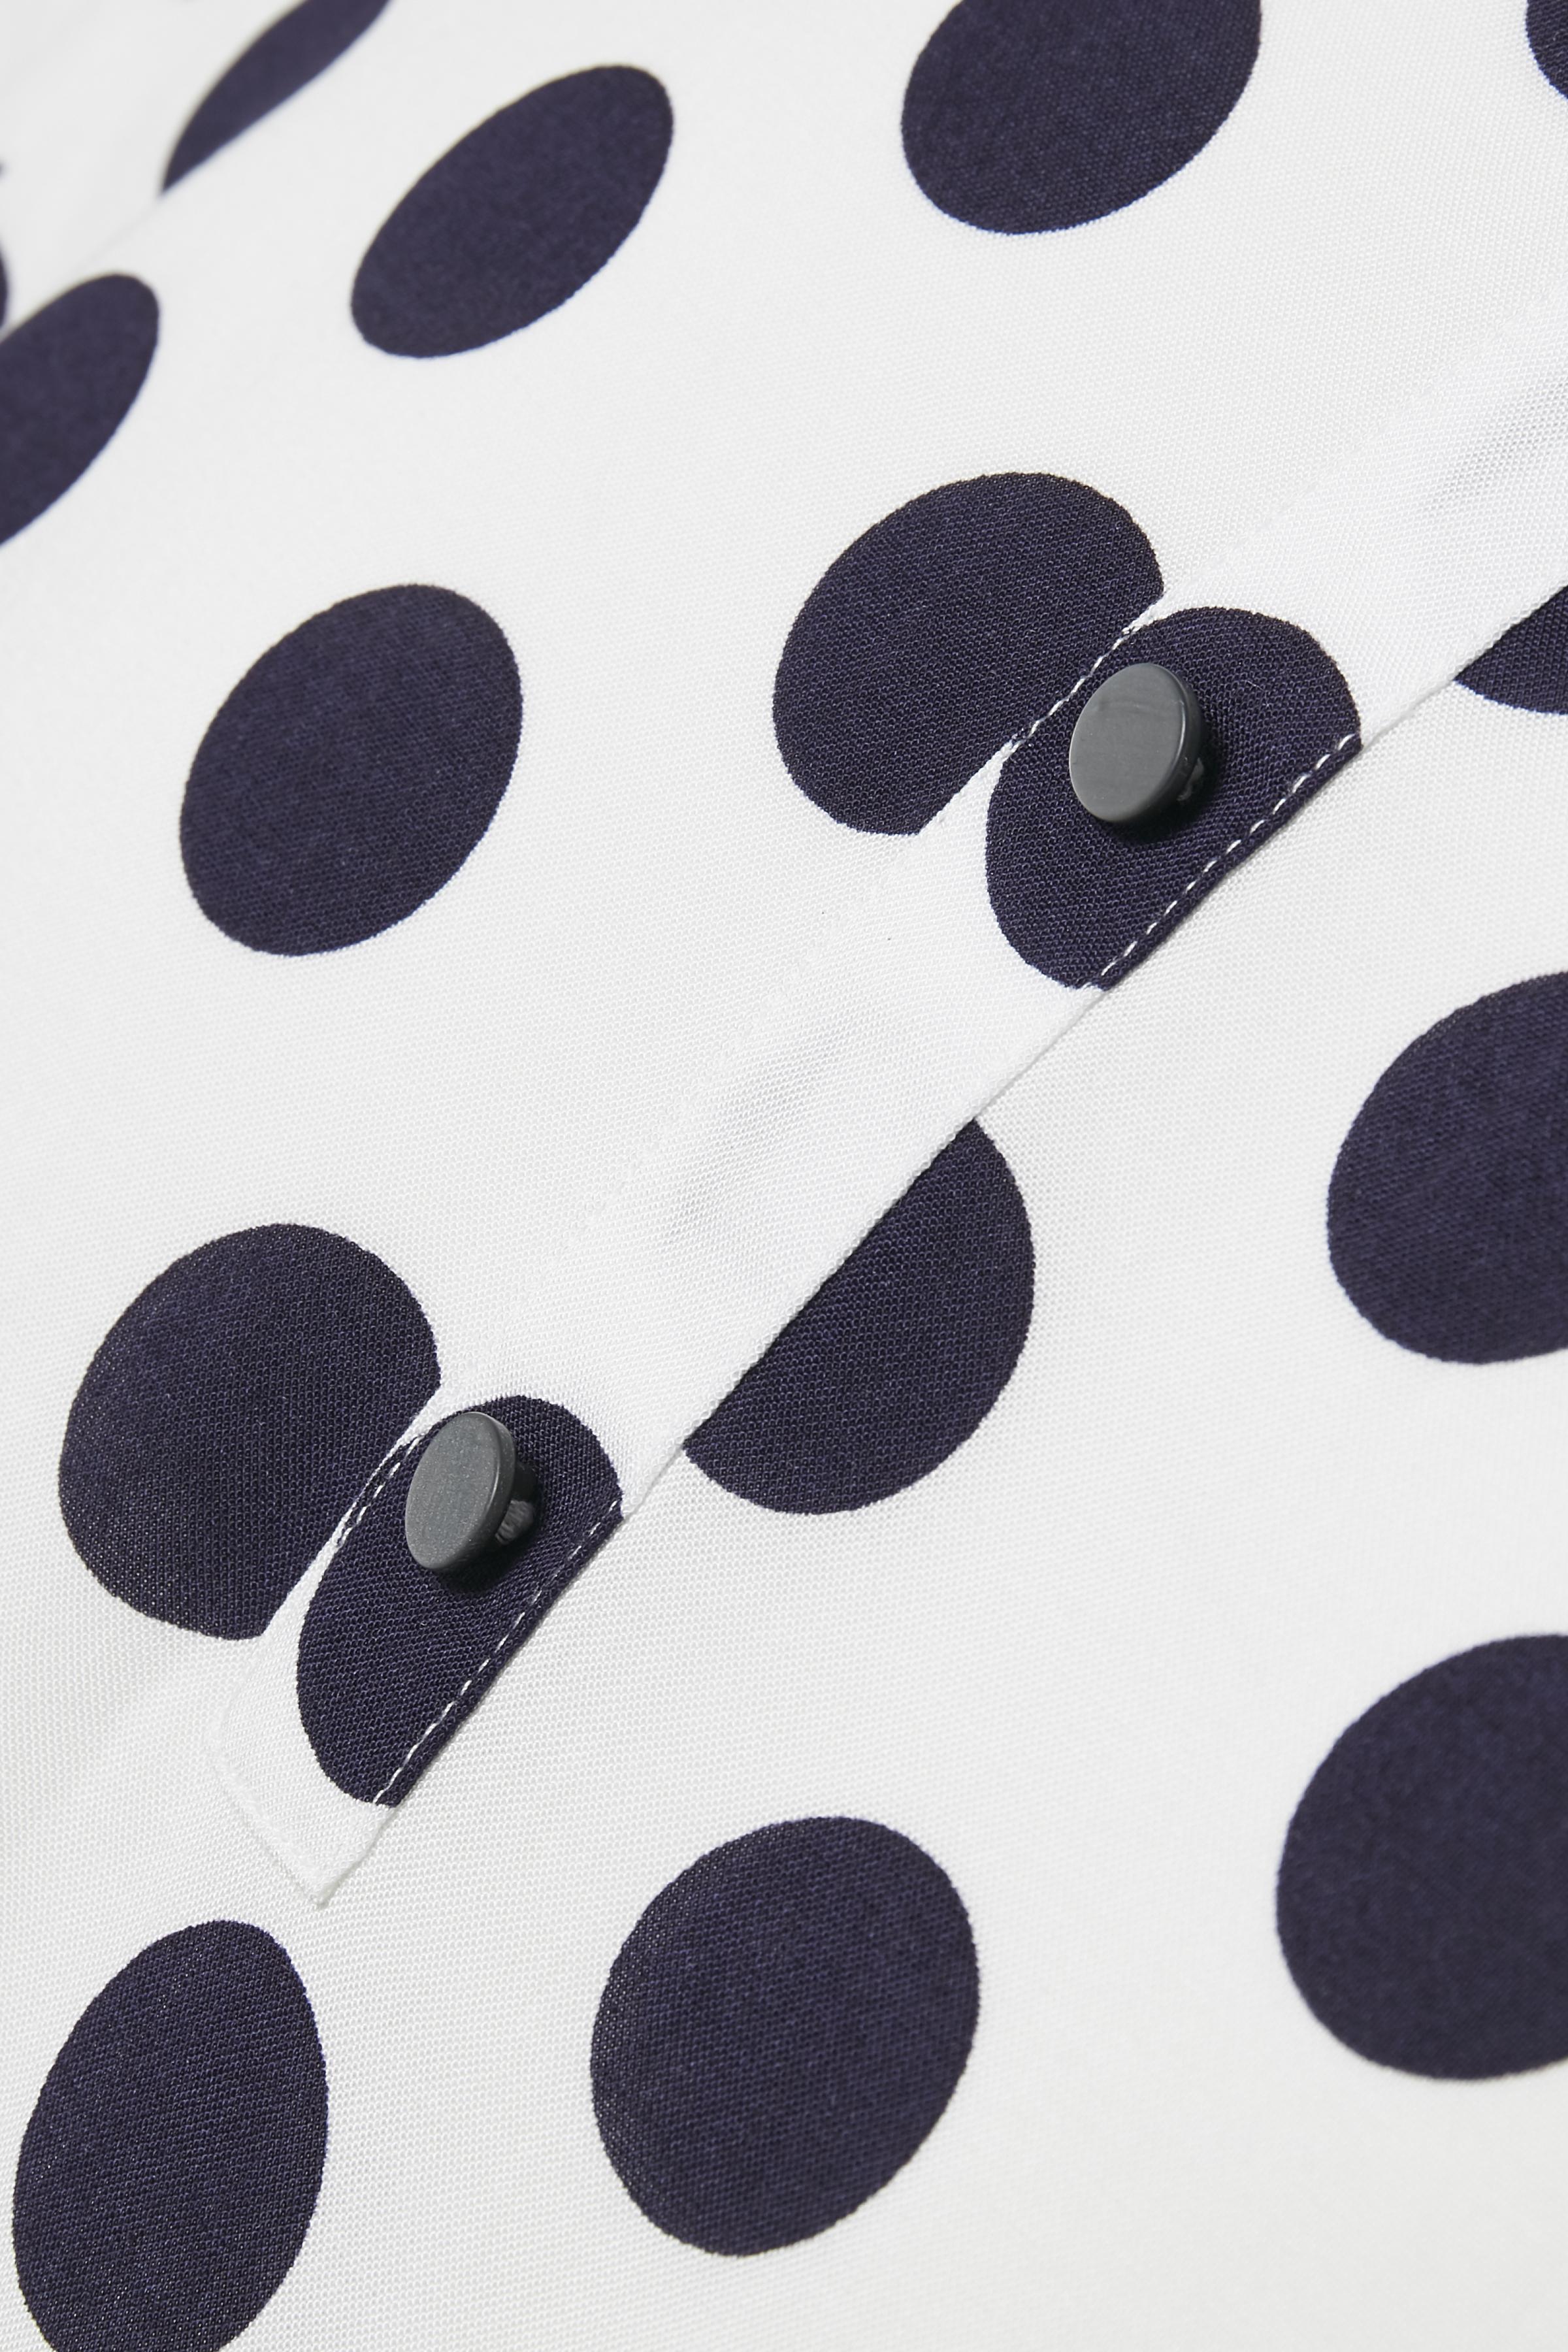 Wollweiß/marineblau Kurzarm-Bluse von Fransa – Shoppen Sie Wollweiß/marineblau Kurzarm-Bluse ab Gr. XS-XXL hier